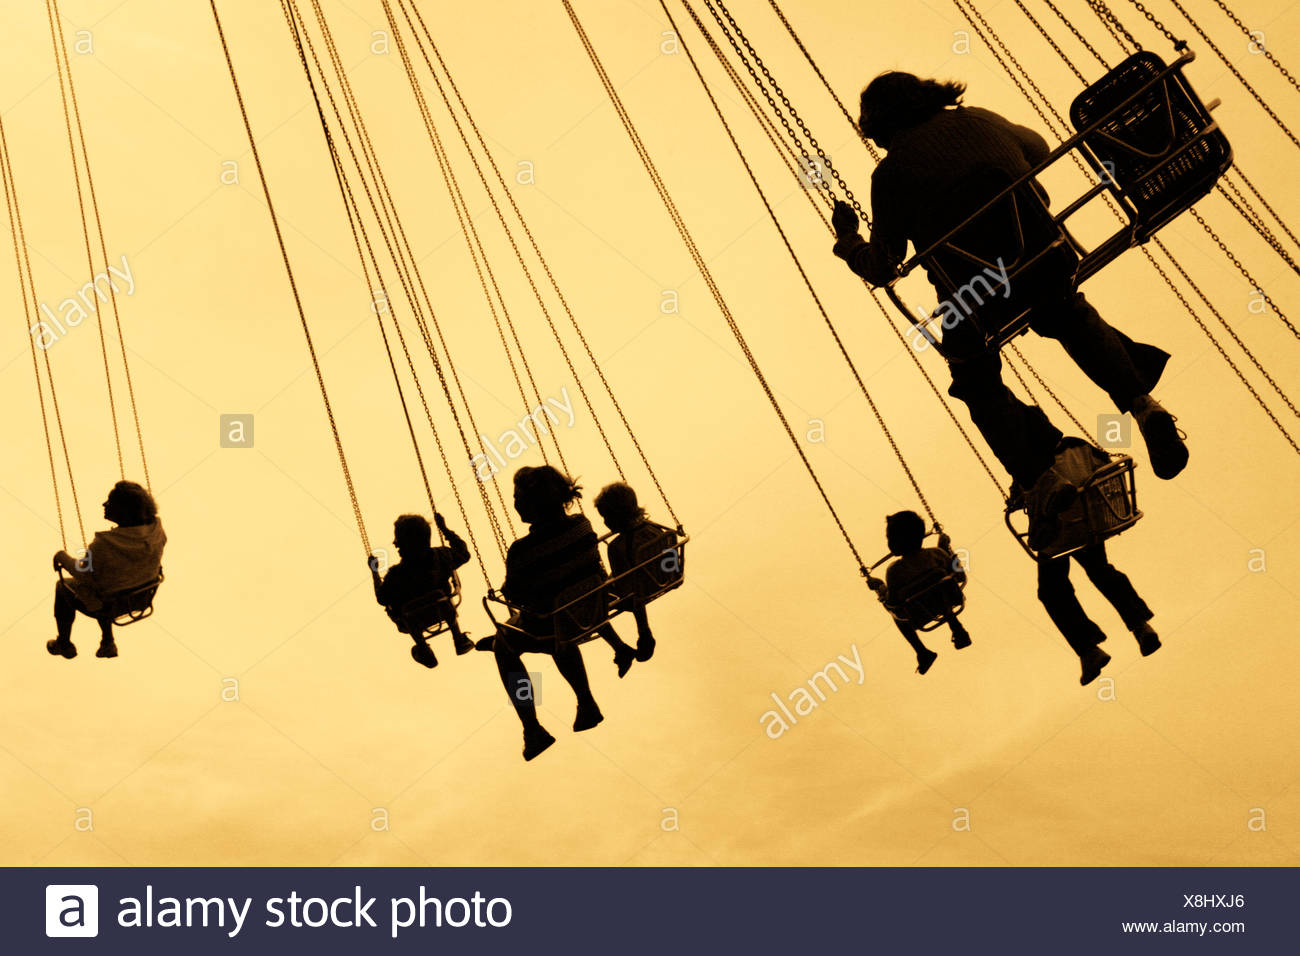 Sweden, Vastra Gotaland, Gothenburg, Silhouettes of people on carousel in Liseberg amusement park - Stock Image